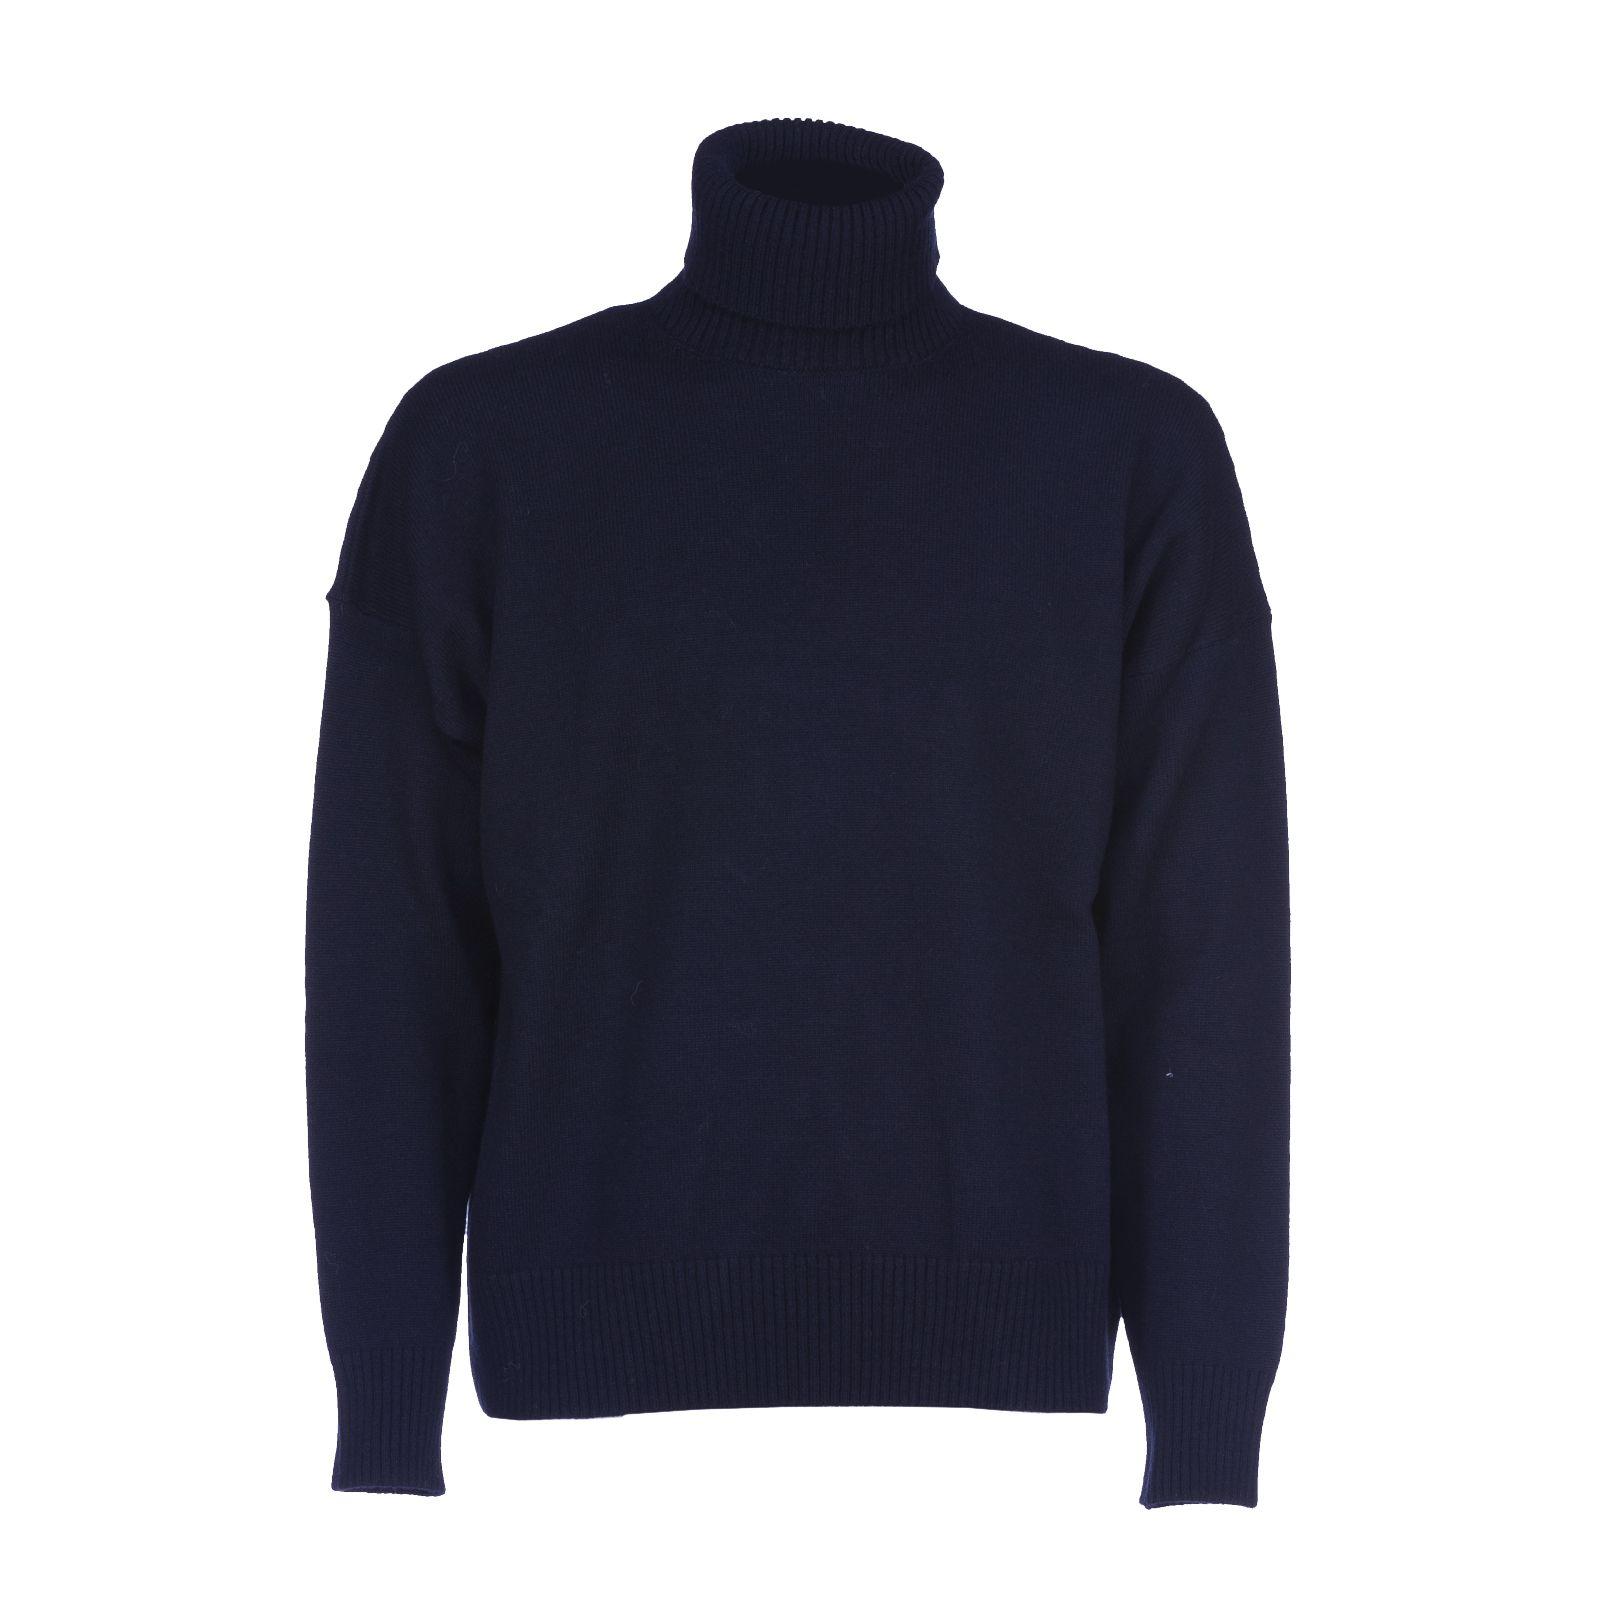 Ami Alexandre Mattiussi Oversized Turtle-neck Sweater